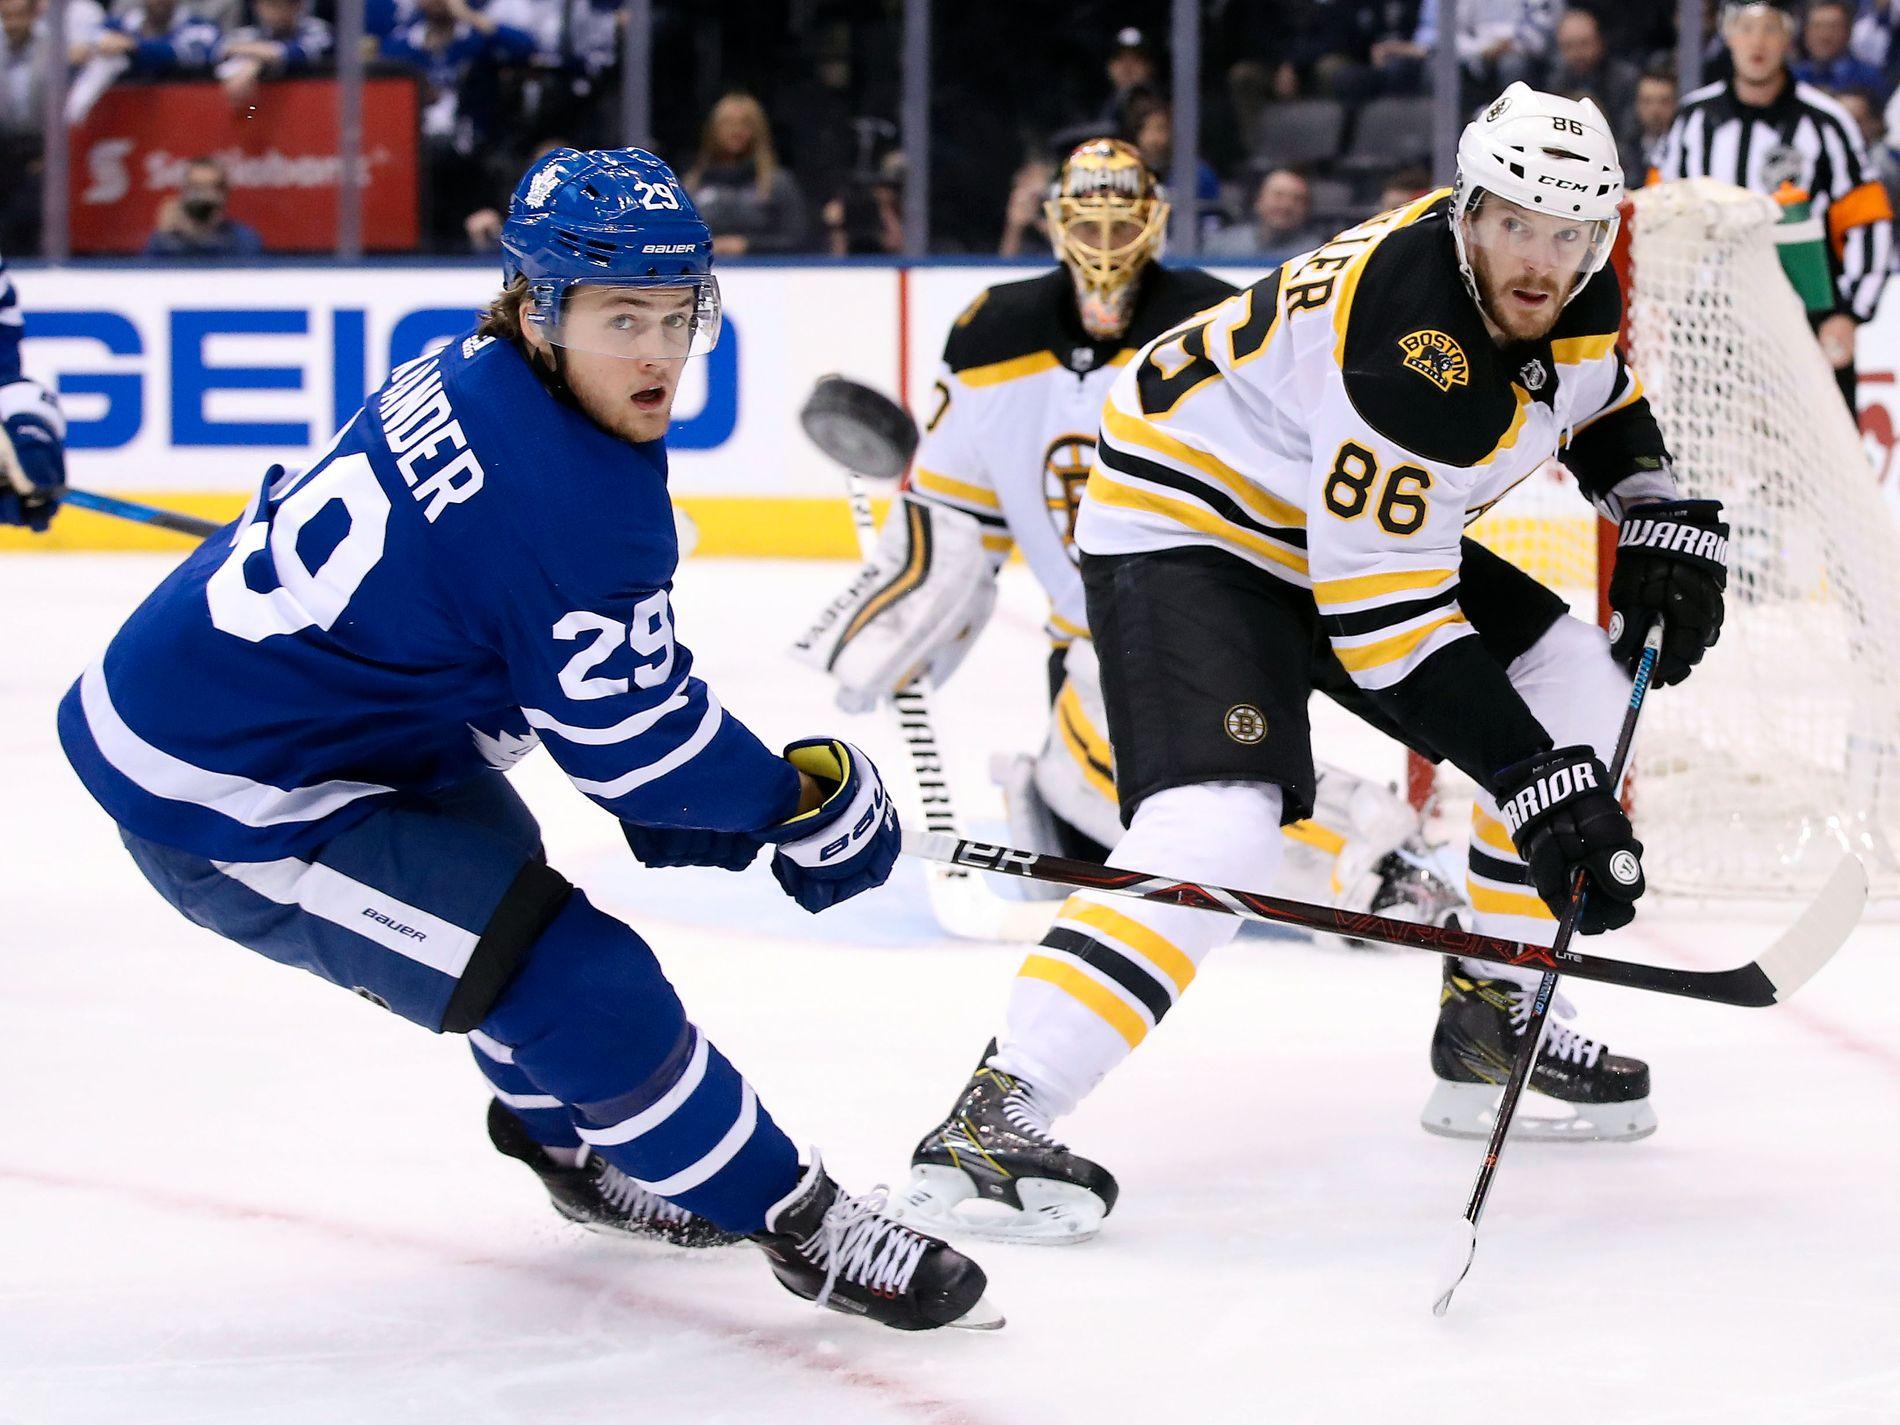 SVENSK STJERNE: William Nylander (t.v.) i kamp med Boston Bruins-backen Kevan Miller i sluttspillet i april. Nå er han uten kontrakt med Toronto Maple Leafs.